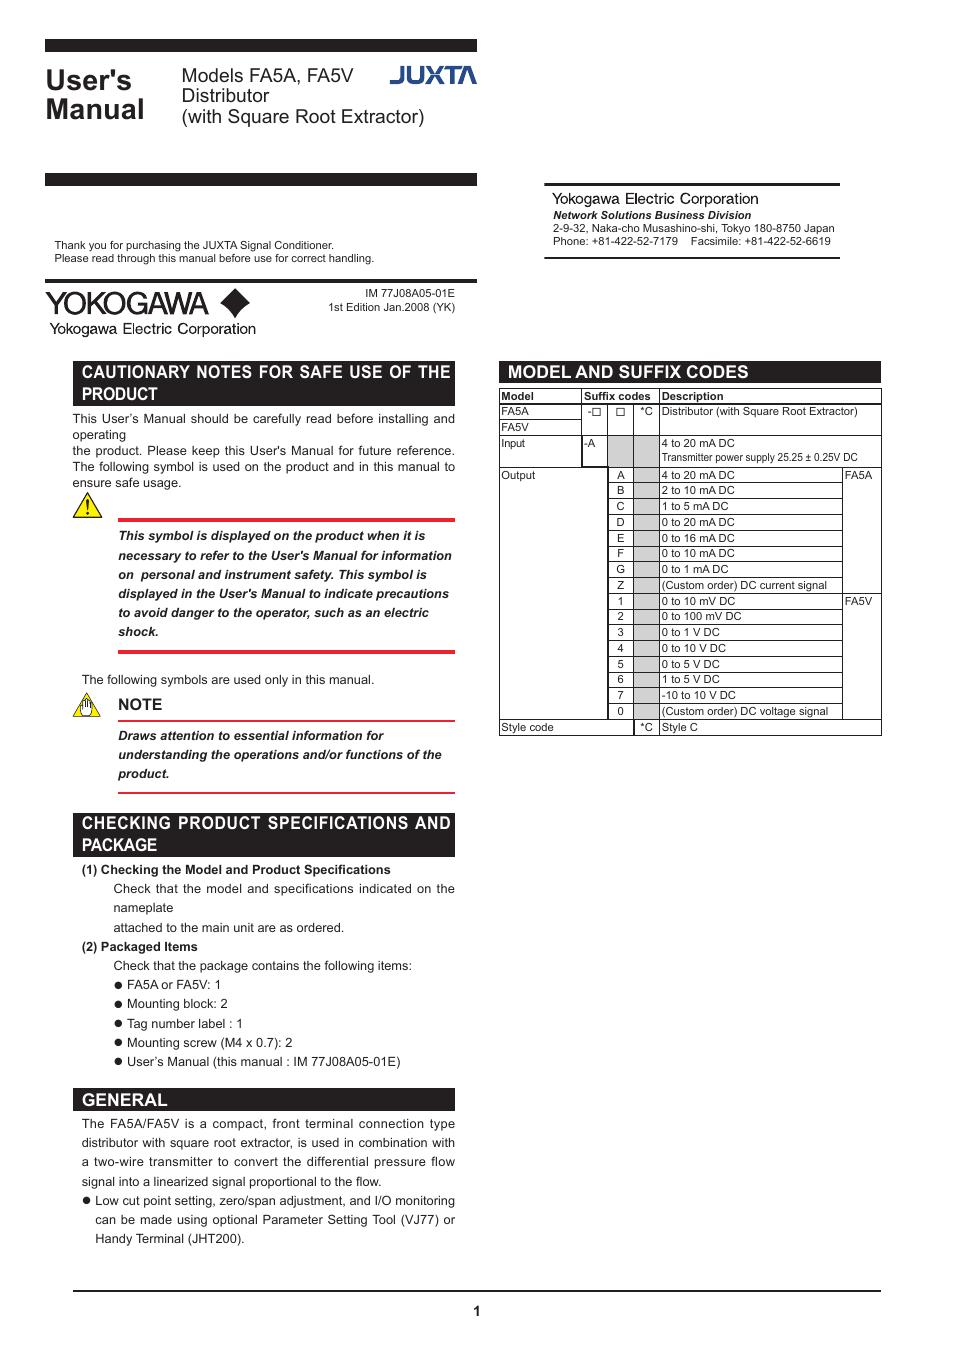 Yokogawa Juxta Fa5v Distributor With Square Root Extractor User